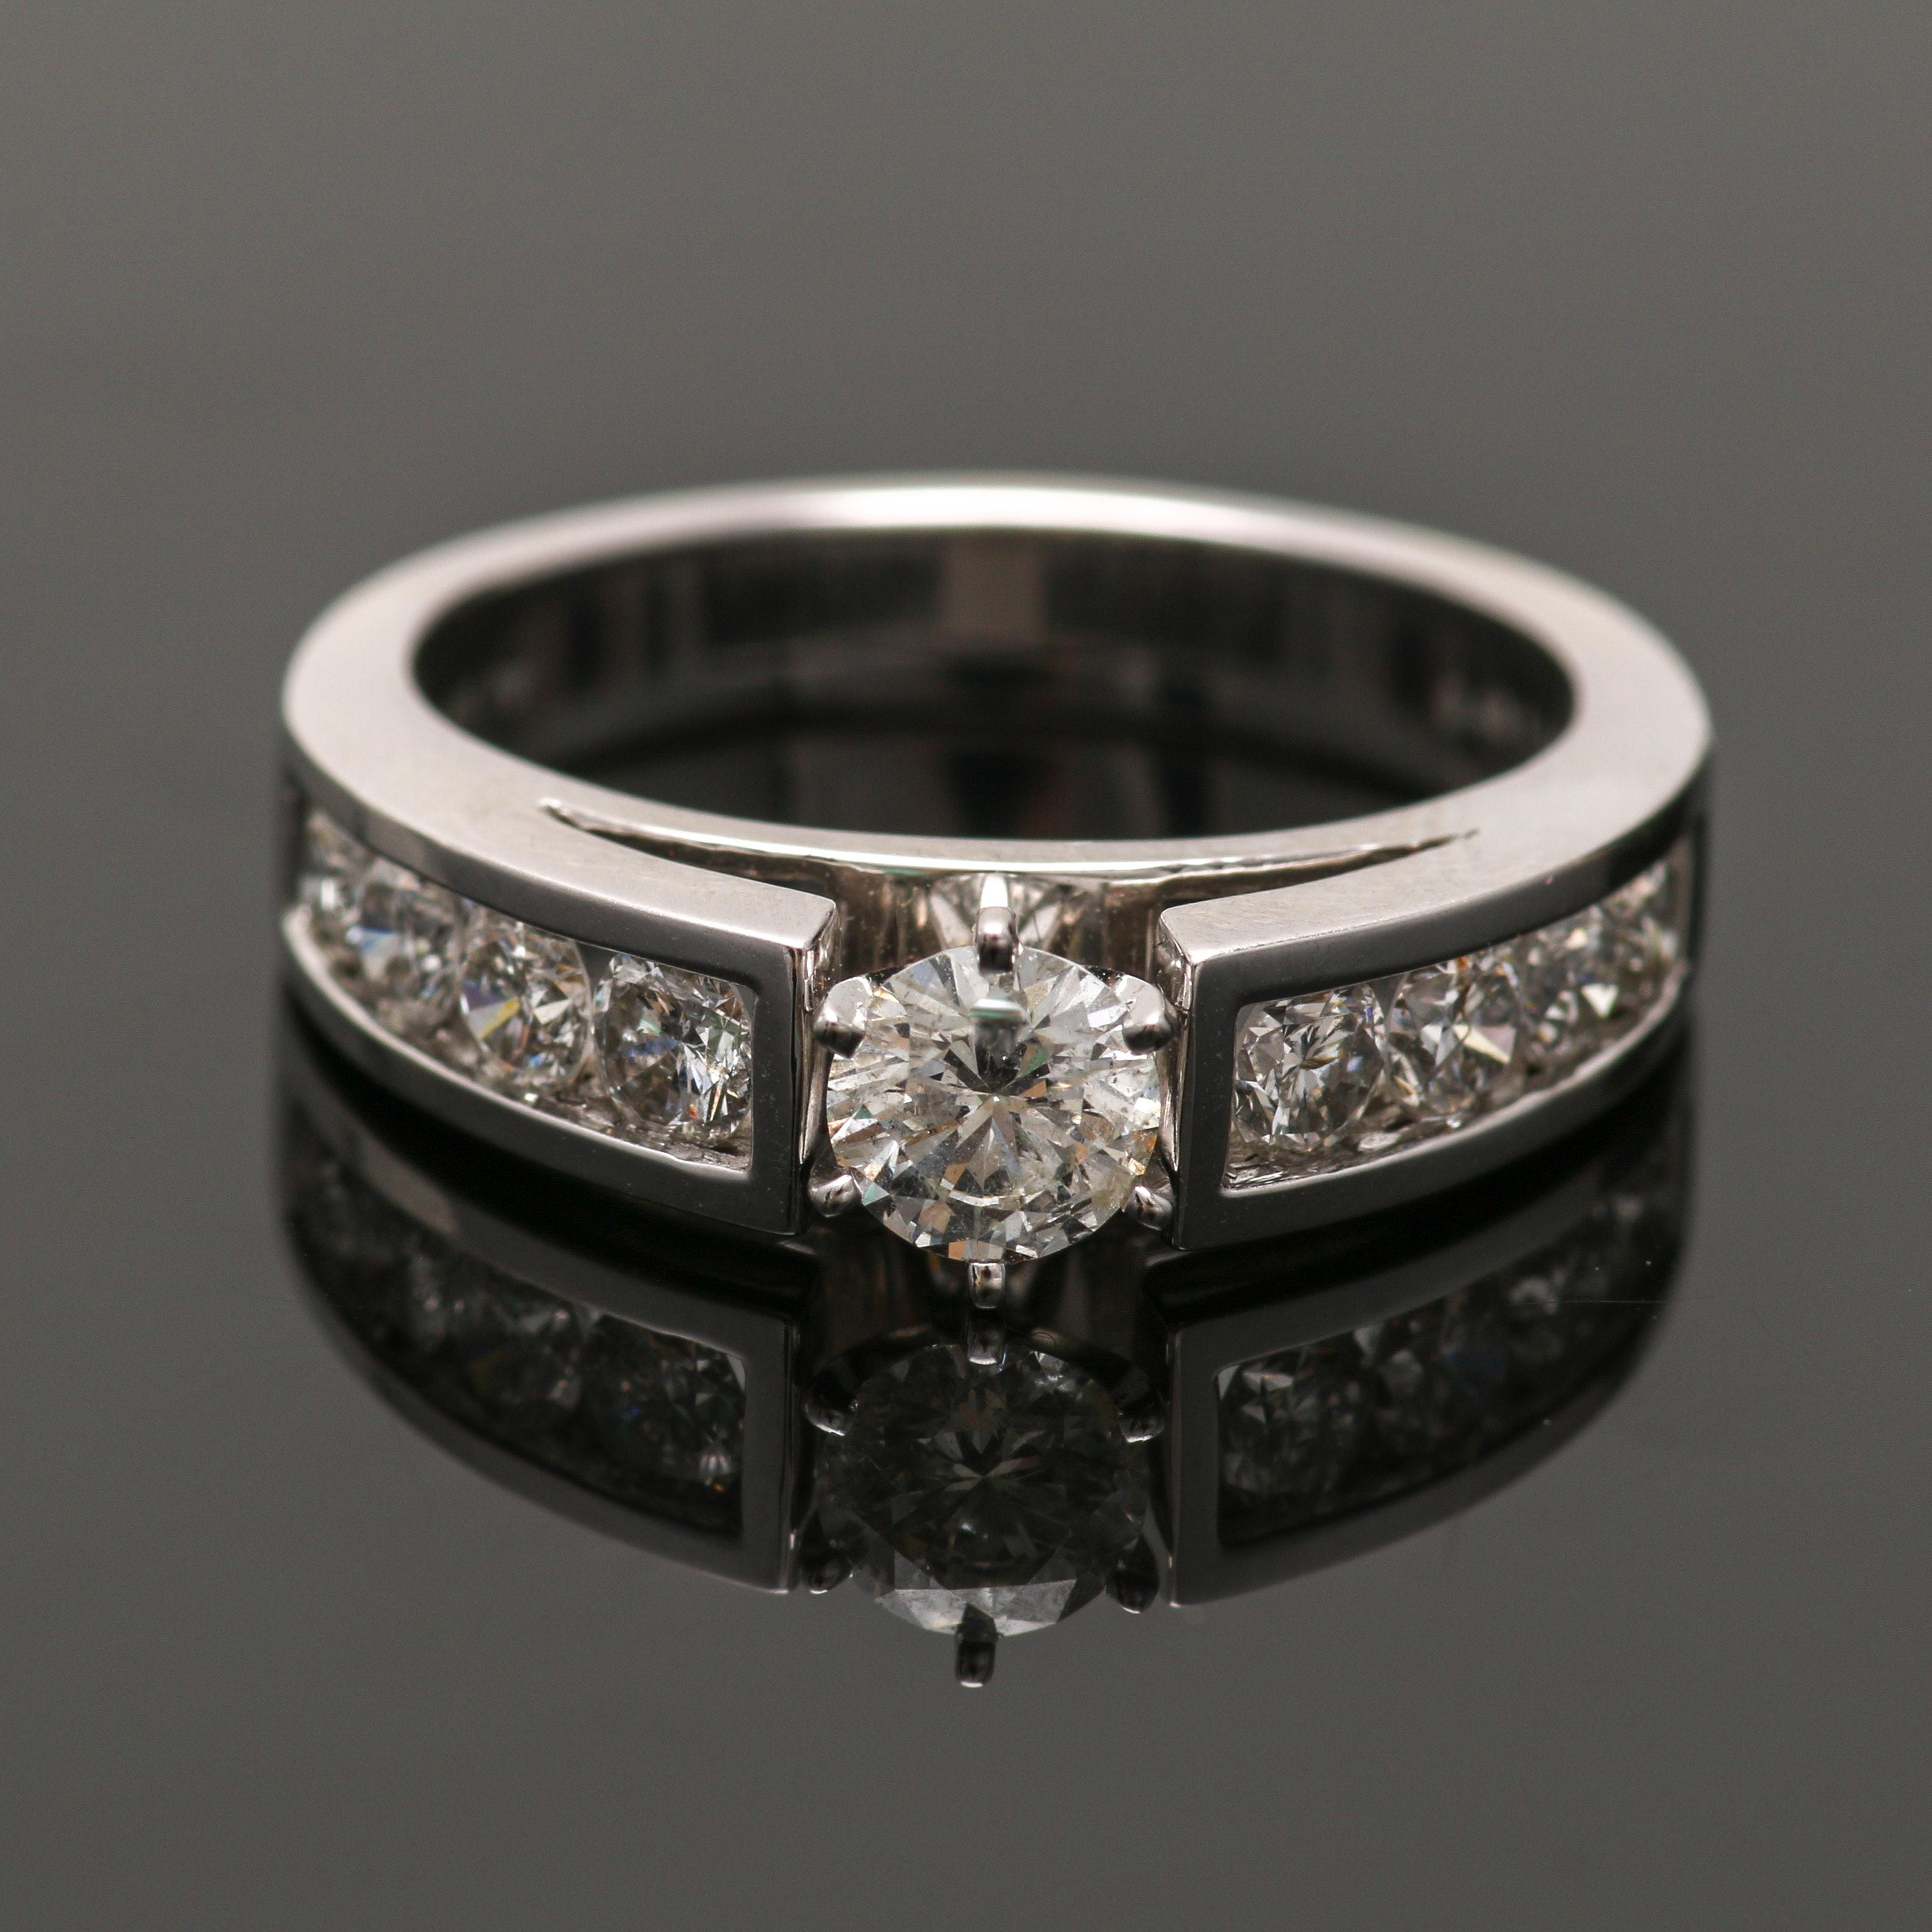 14K White Gold 1.14 CTW Diamond Ring